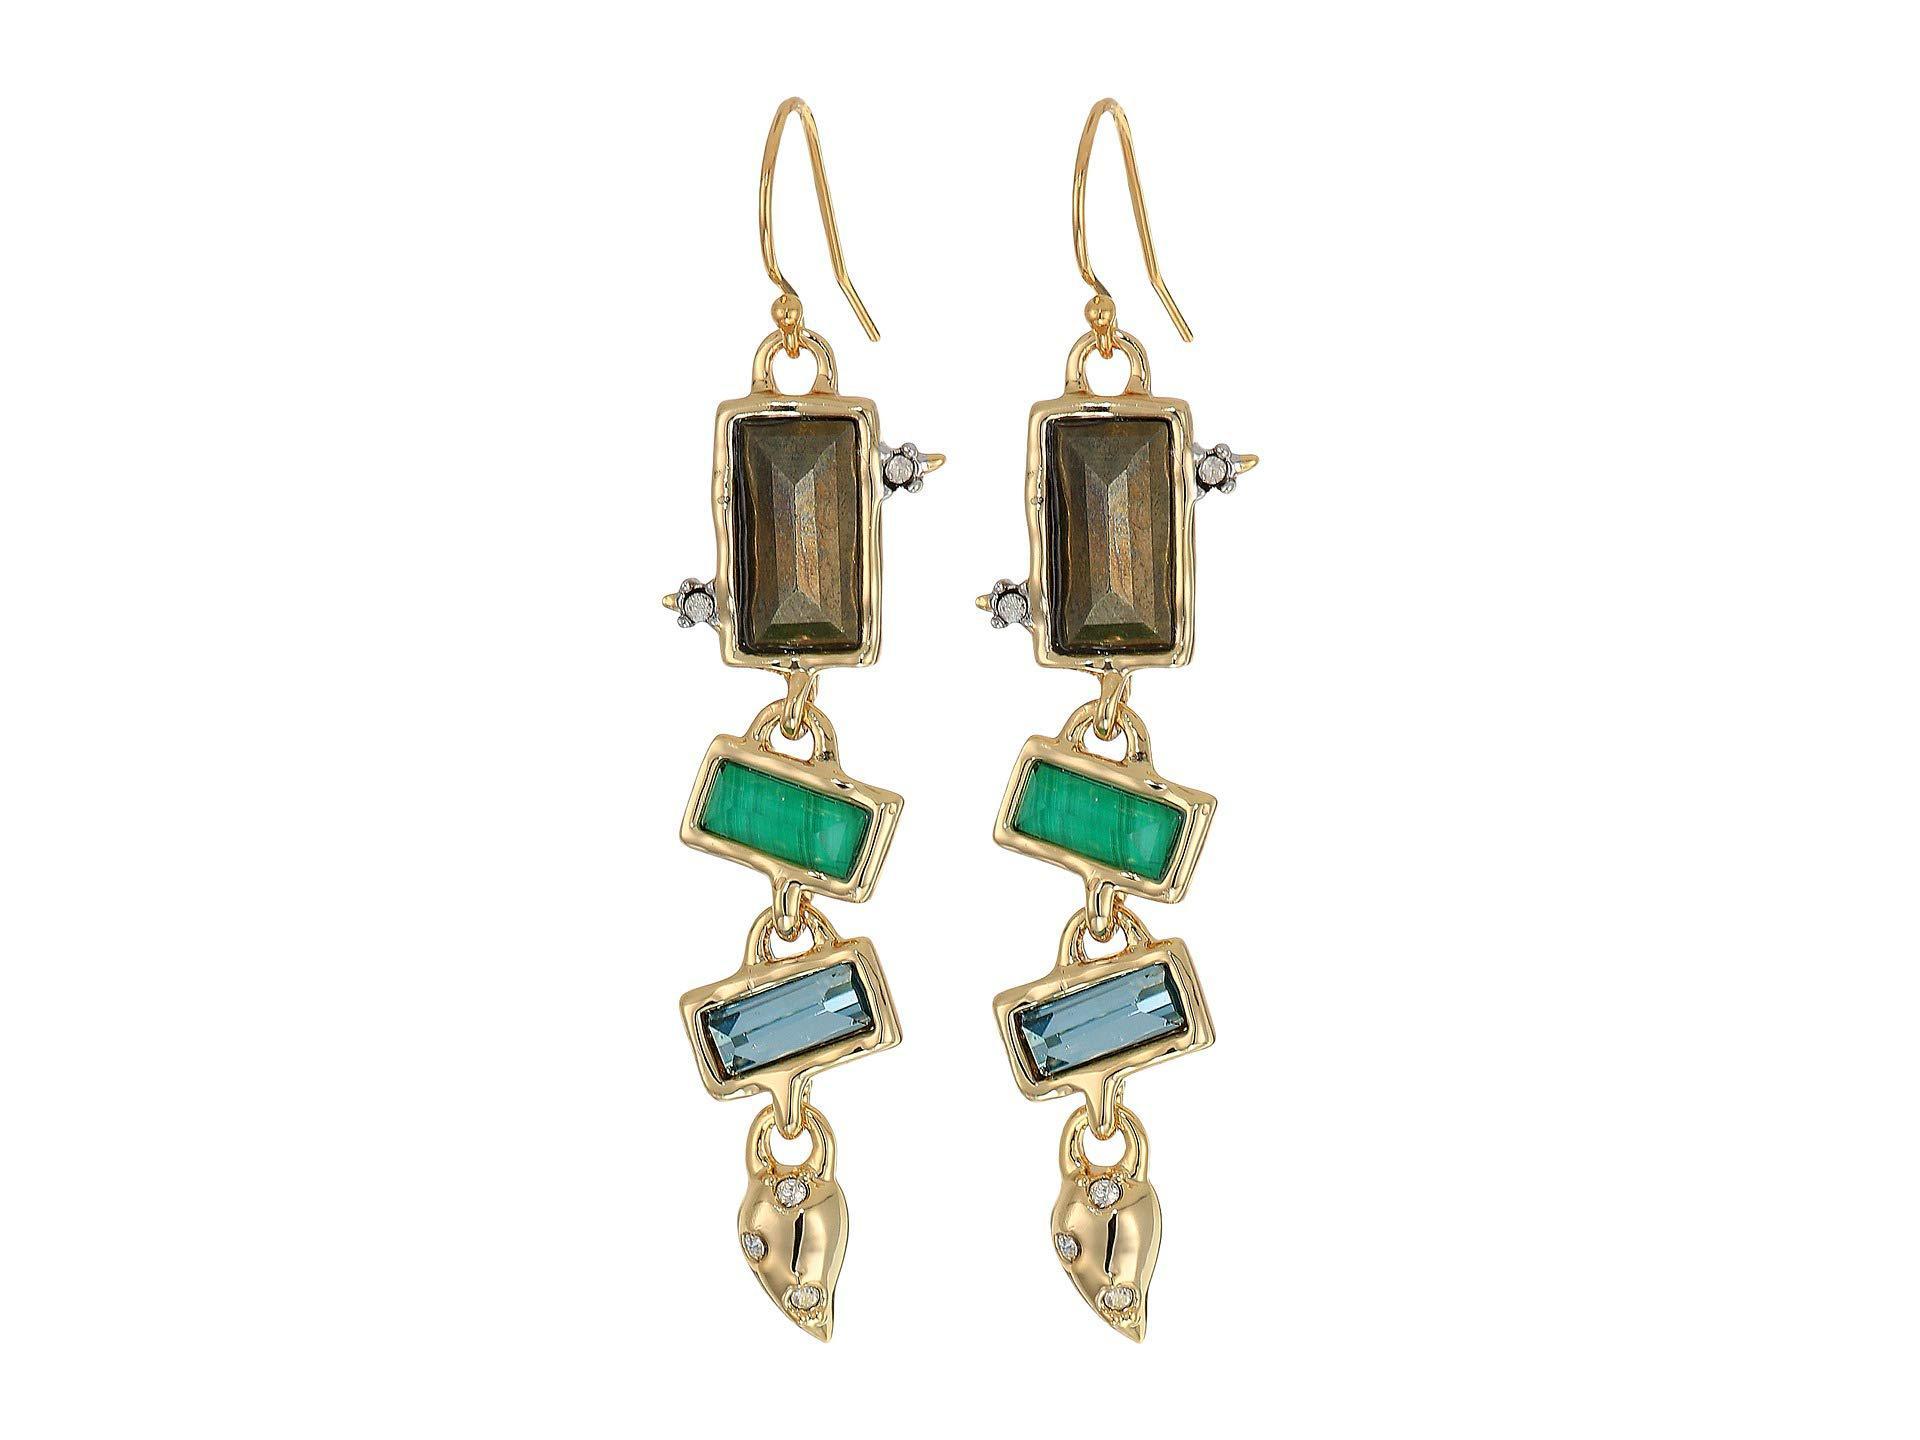 5a8a60a37 Lyst - Alexis Bittar Molten Multi-stone Wire Earrings (10k Gold ...